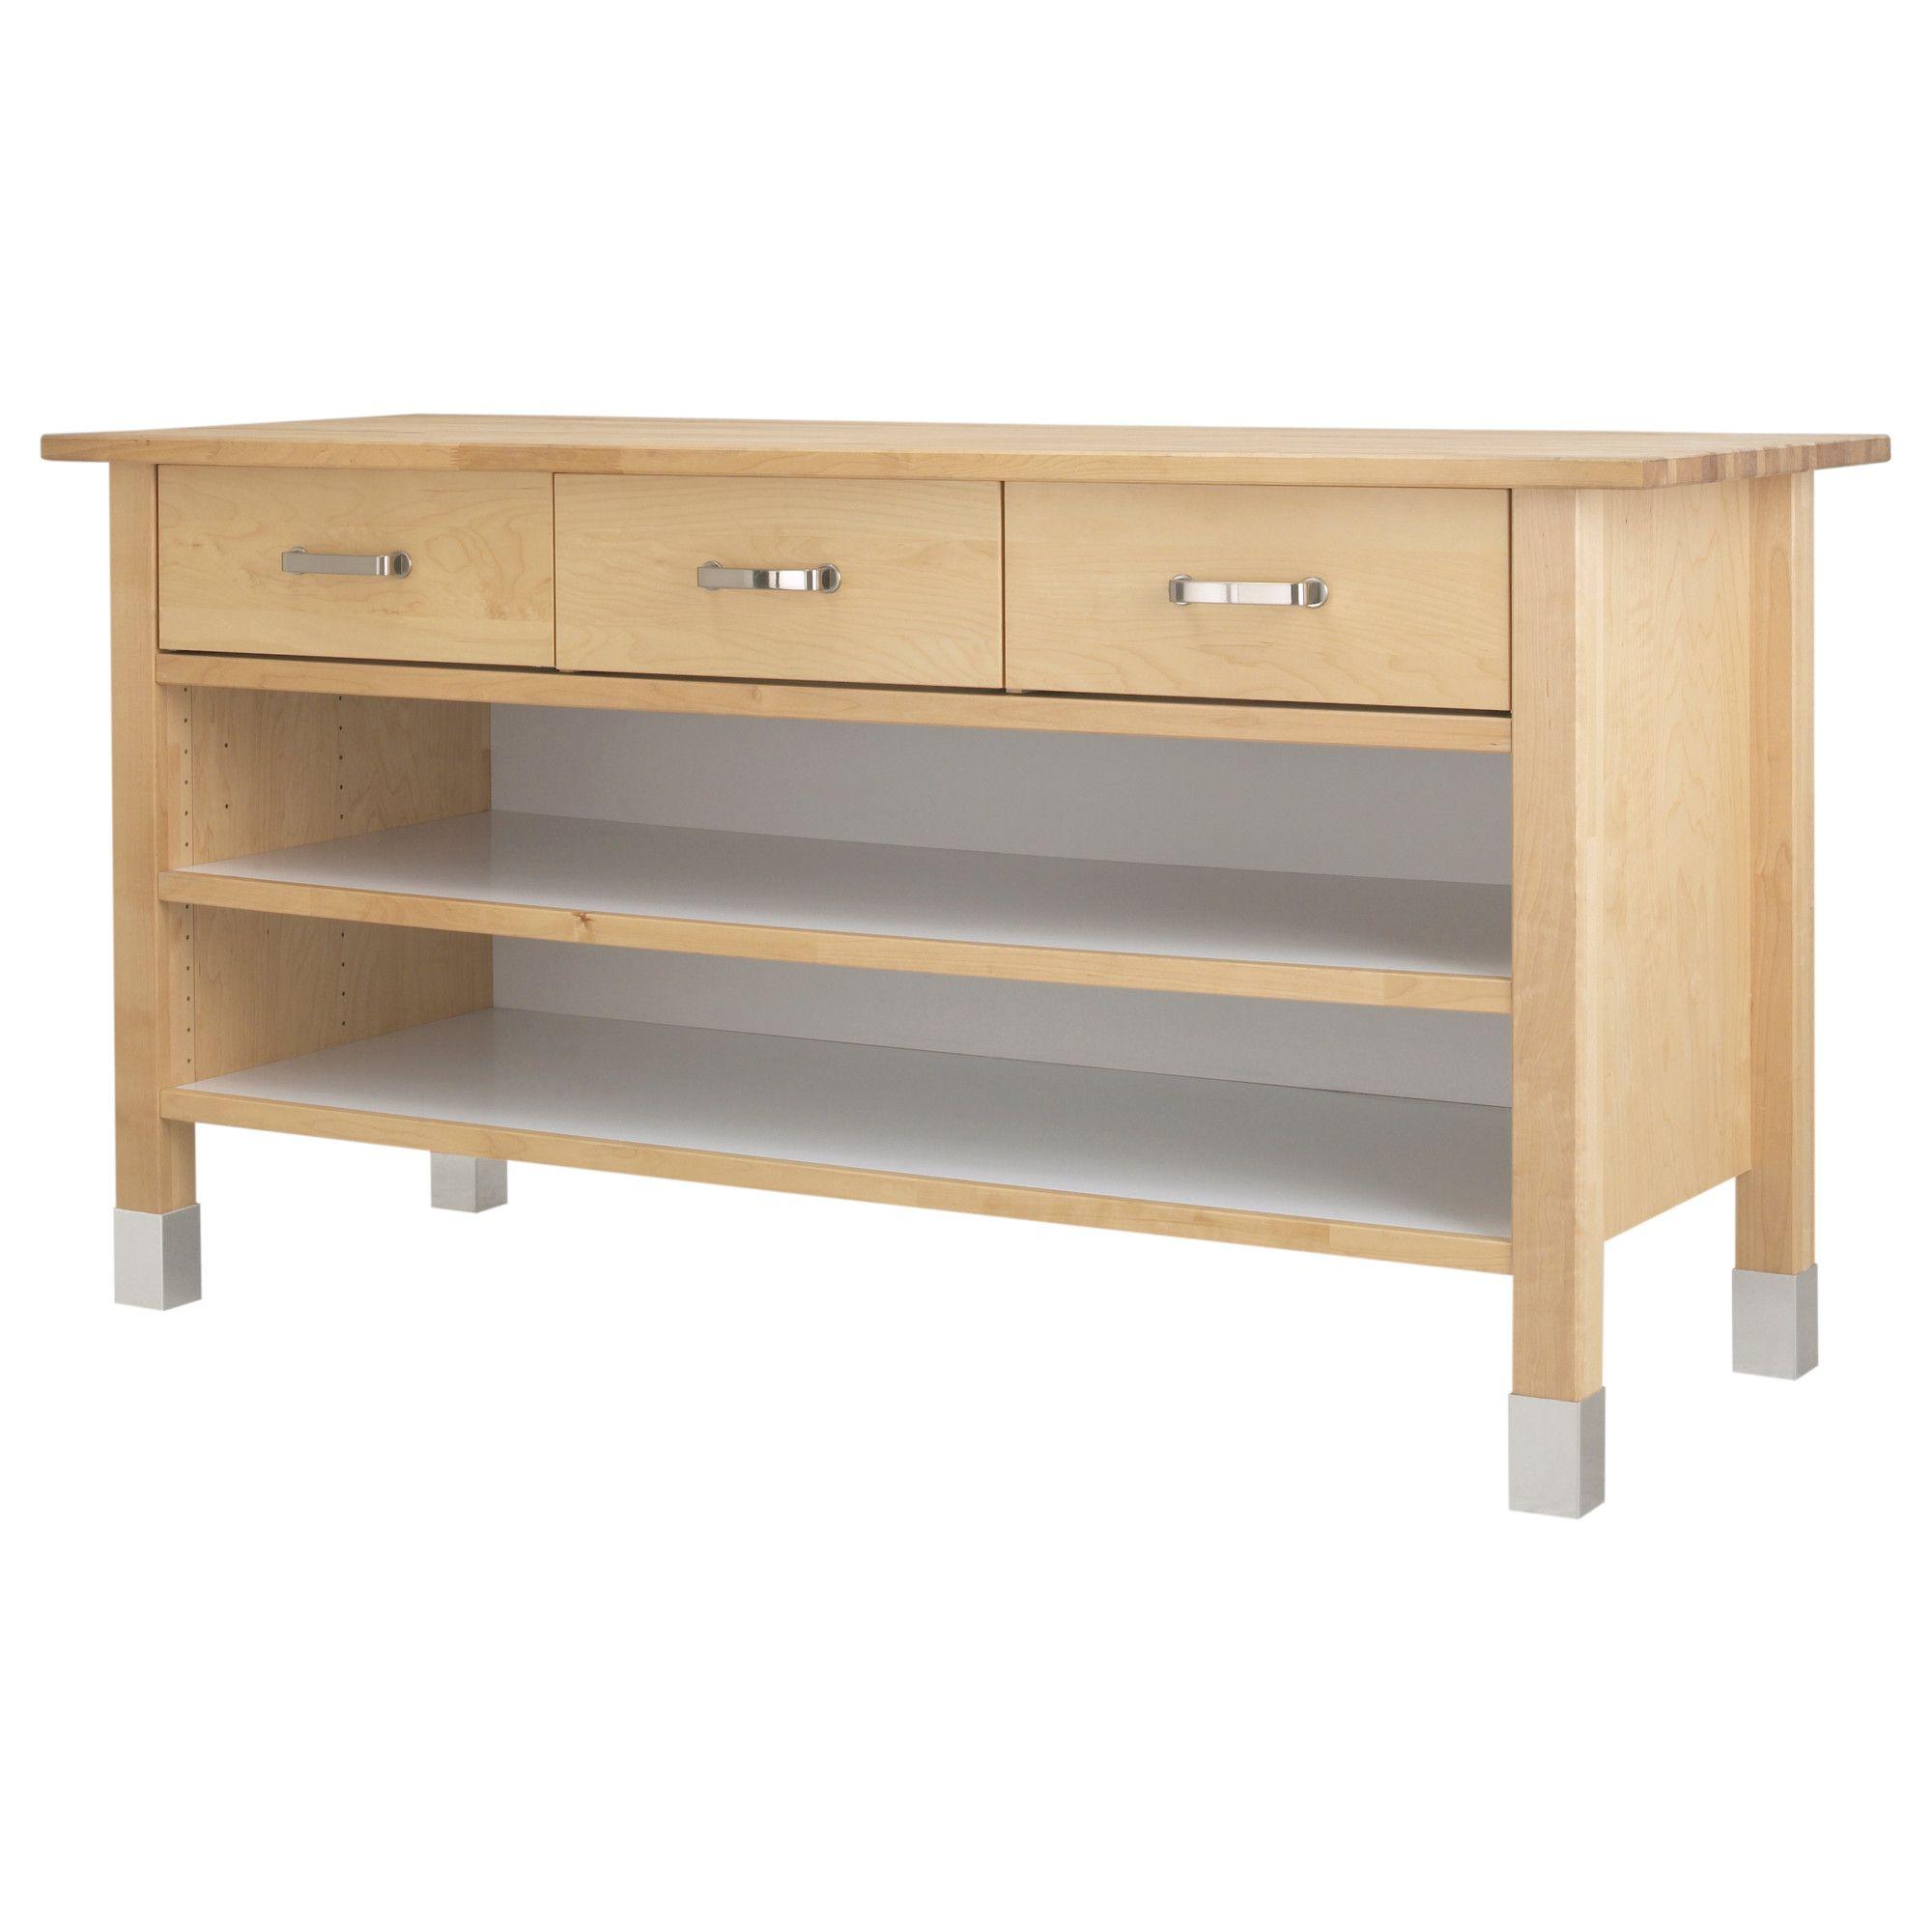 Ikea Us Furniture And Home Furnishings Ikea Varde Free Standing Kitchen Units Ikea Kitchen